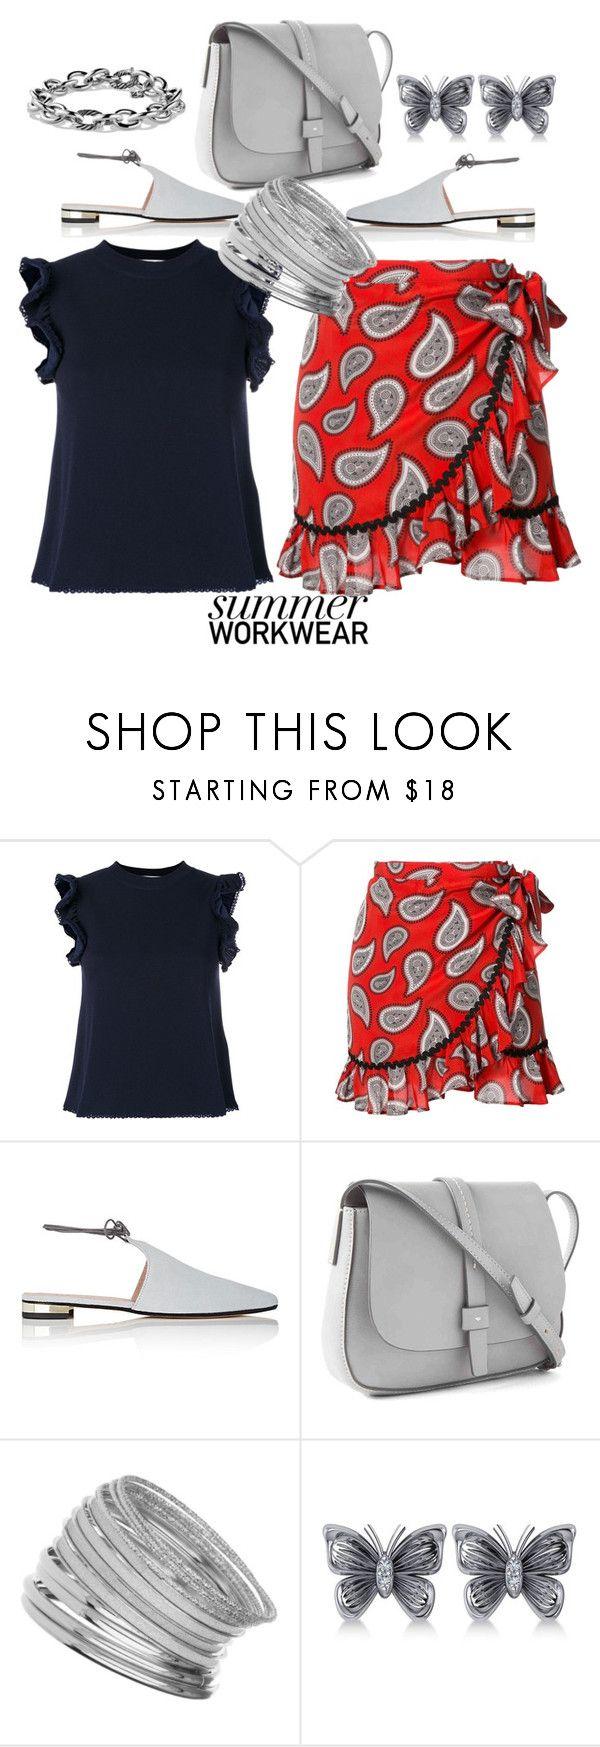 """Summer Workwear"" by helenaymangual ❤ liked on Polyvore featuring See by Chloé, Dodo Bar Or, Barneys New York, Gap, Miss Selfridge, Allurez and David Yurman"